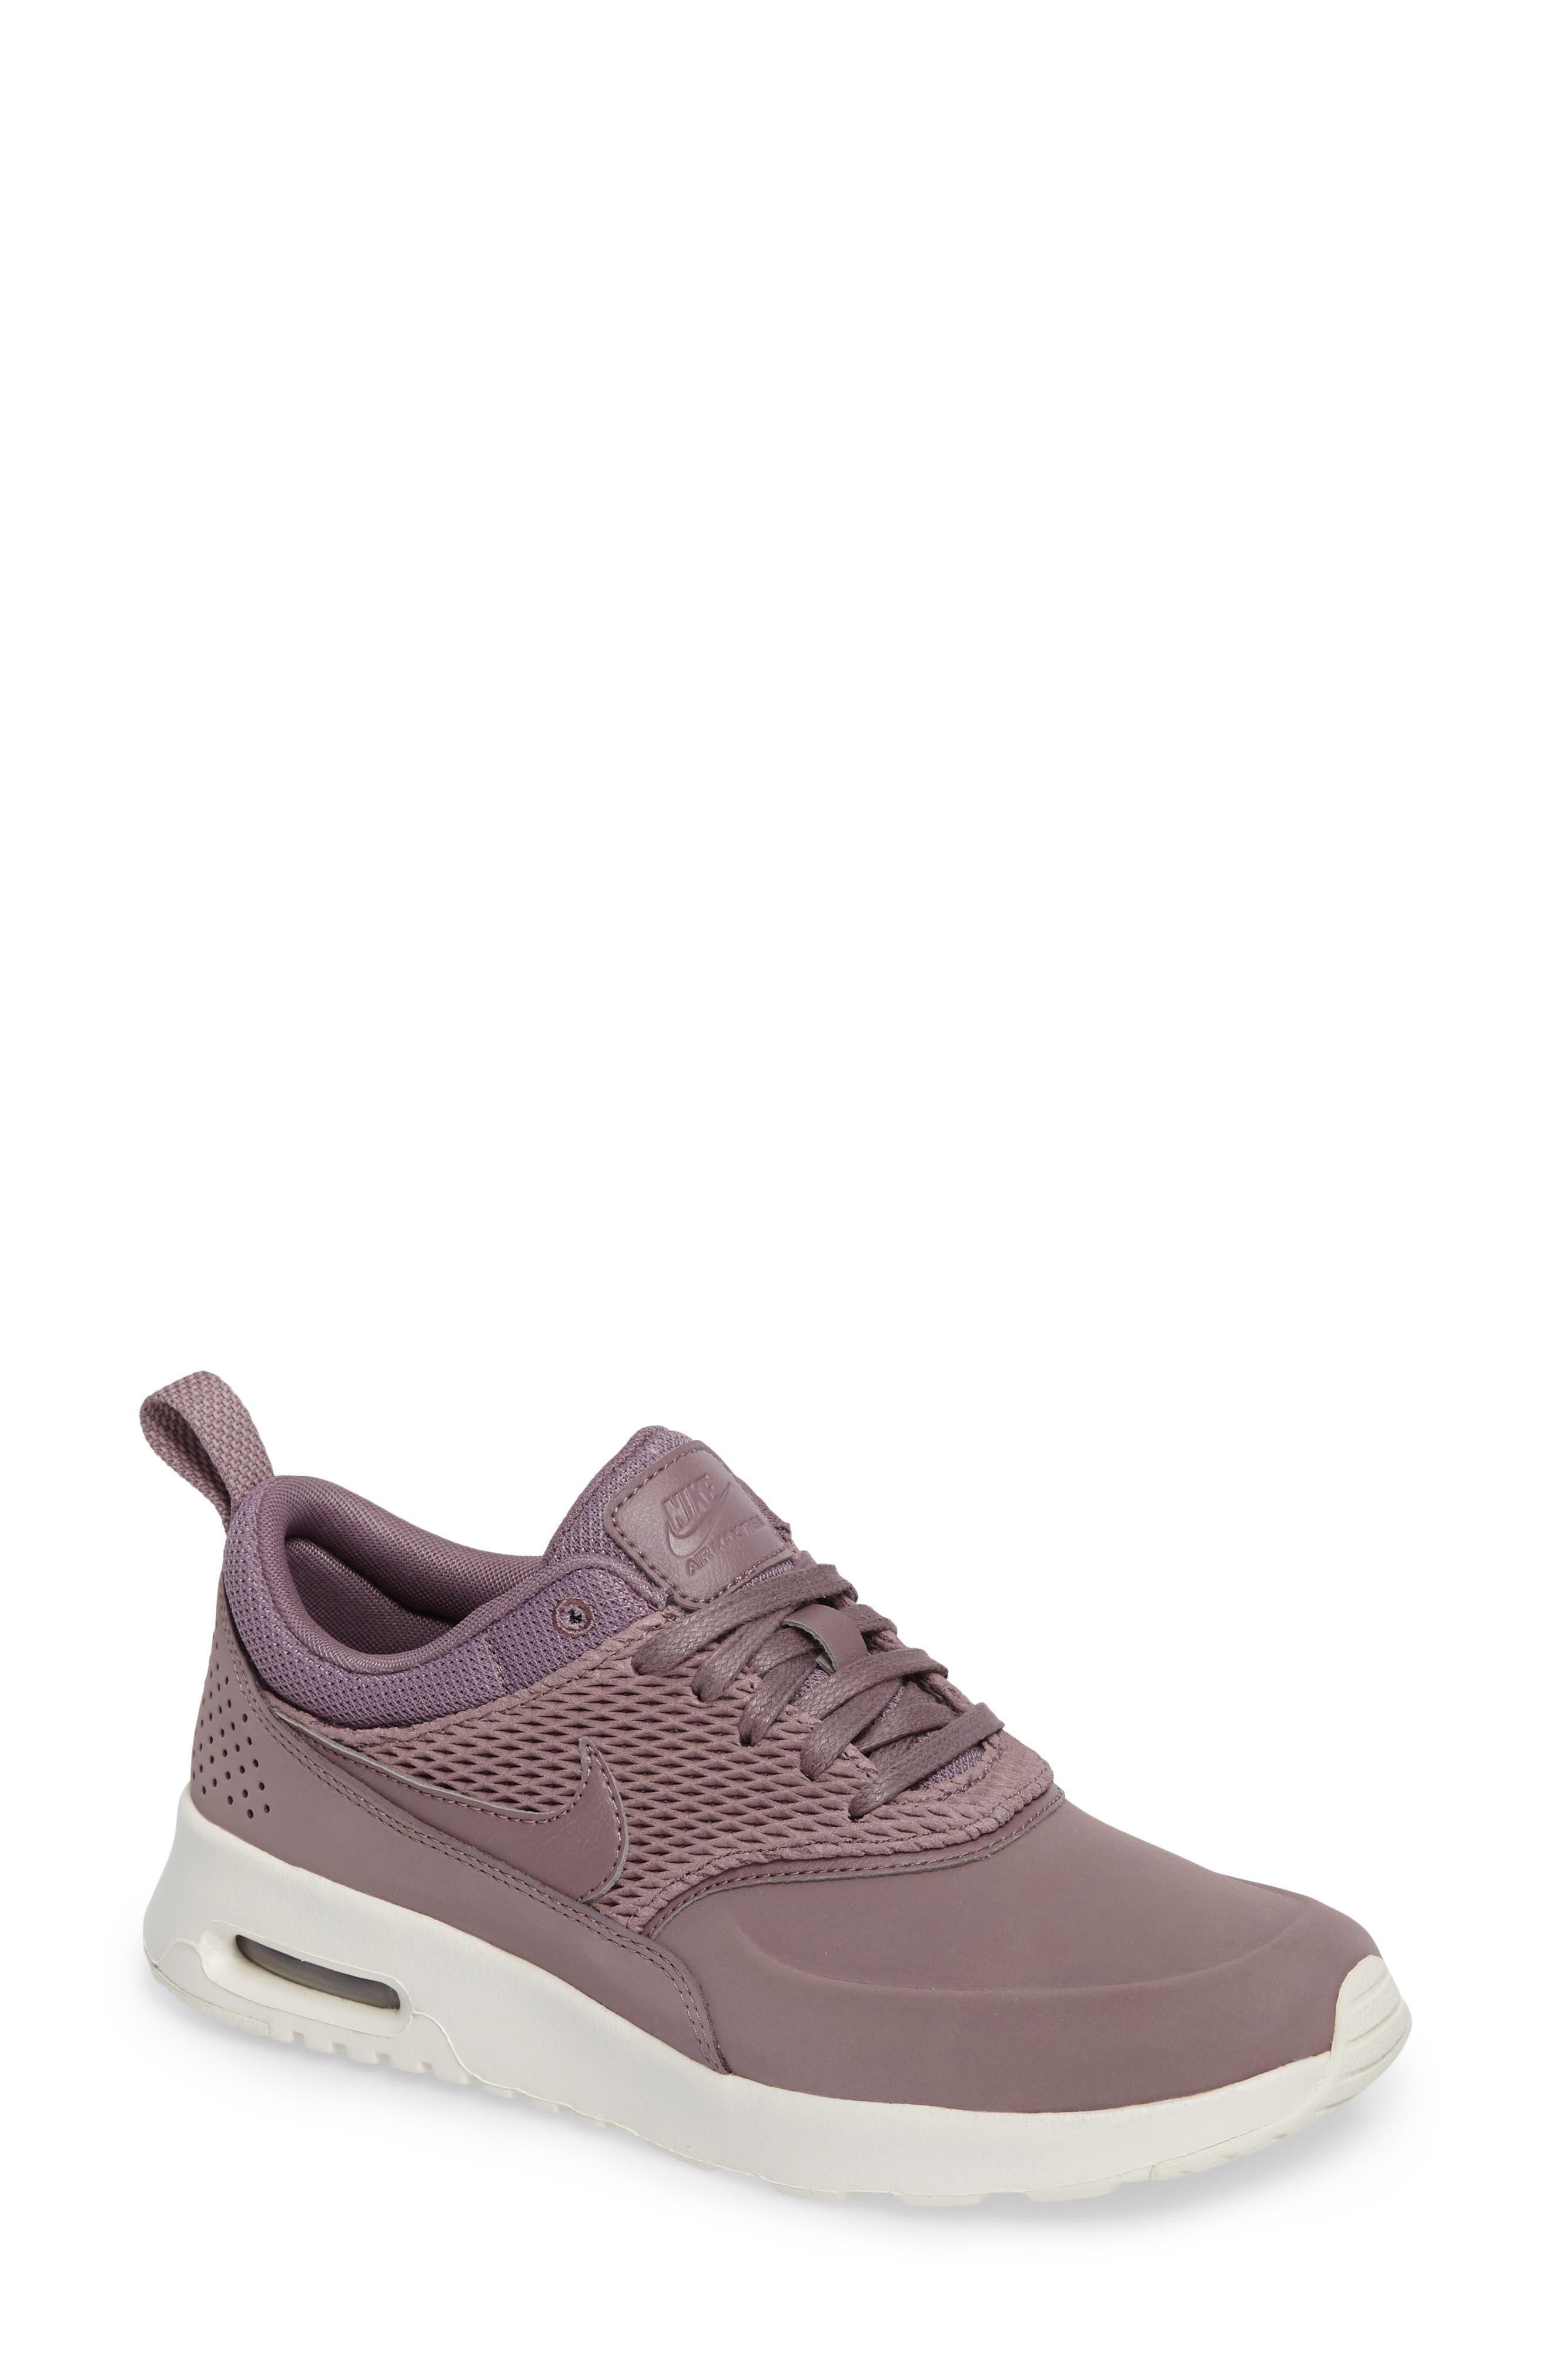 Air Max Thea Premium Sneaker,                             Main thumbnail 1, color,                             025